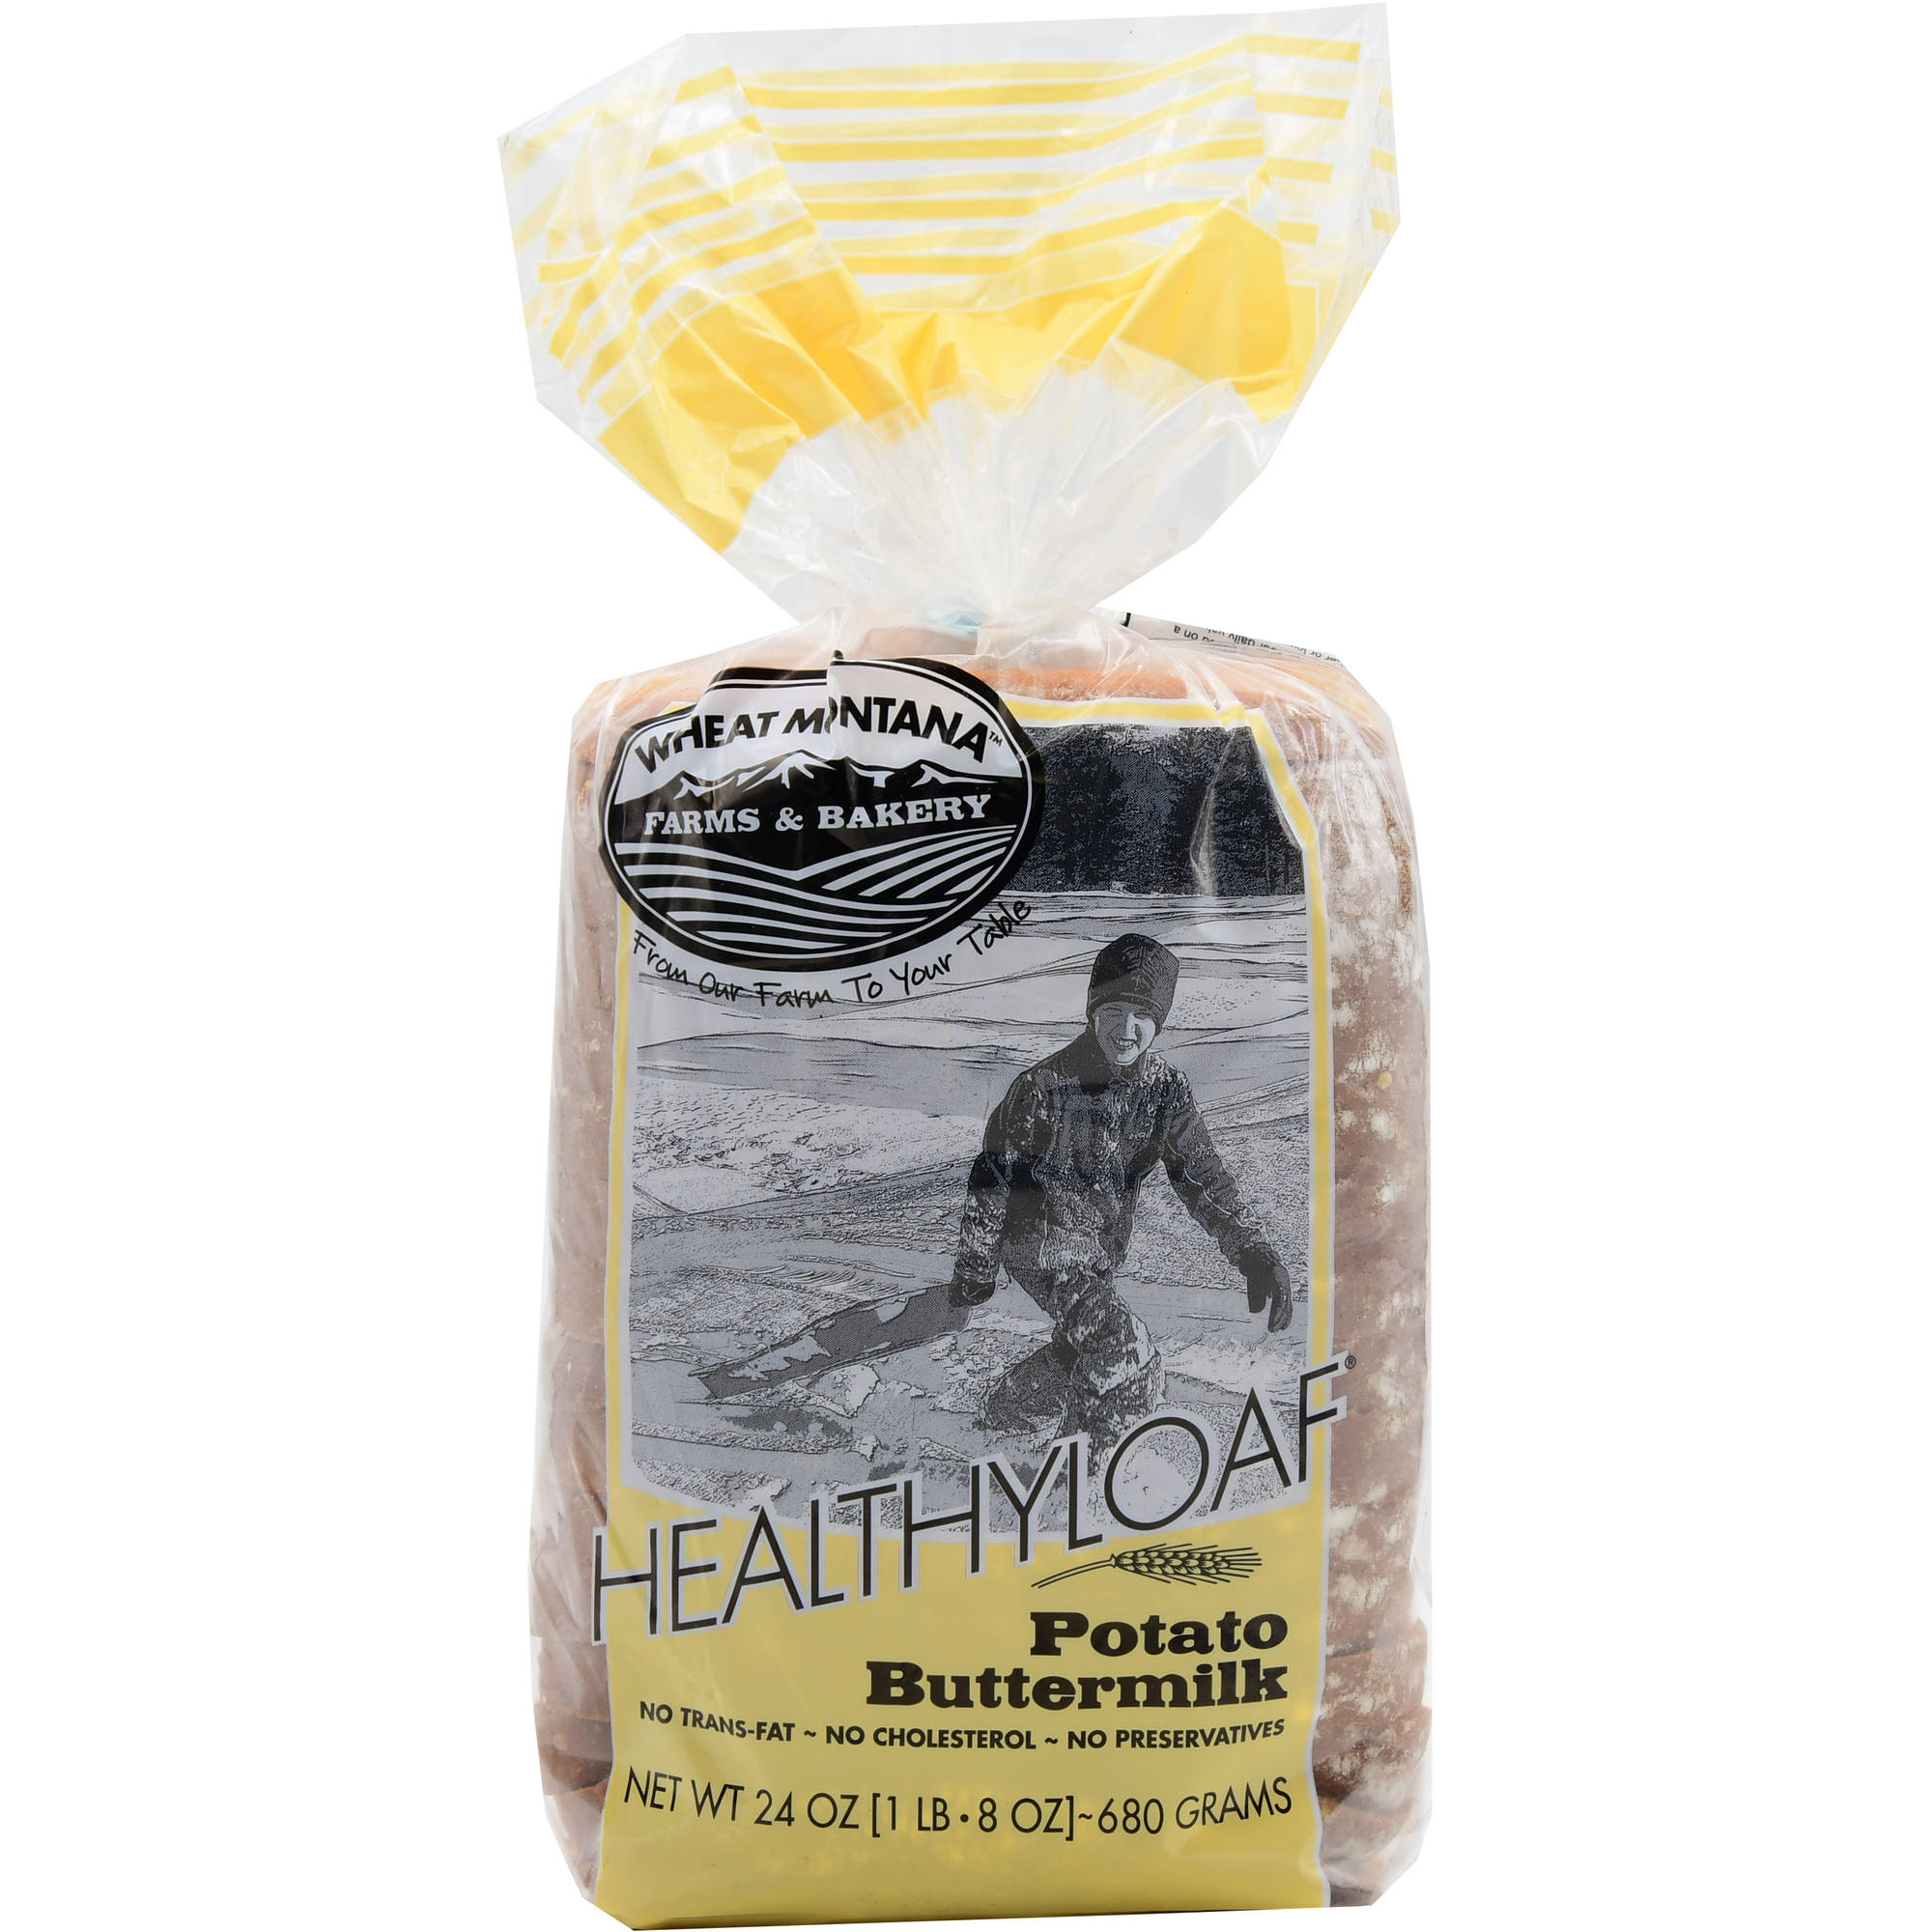 Wheat Montana: Potato Buttermilk Healthy Loaf Bread, 24 Oz